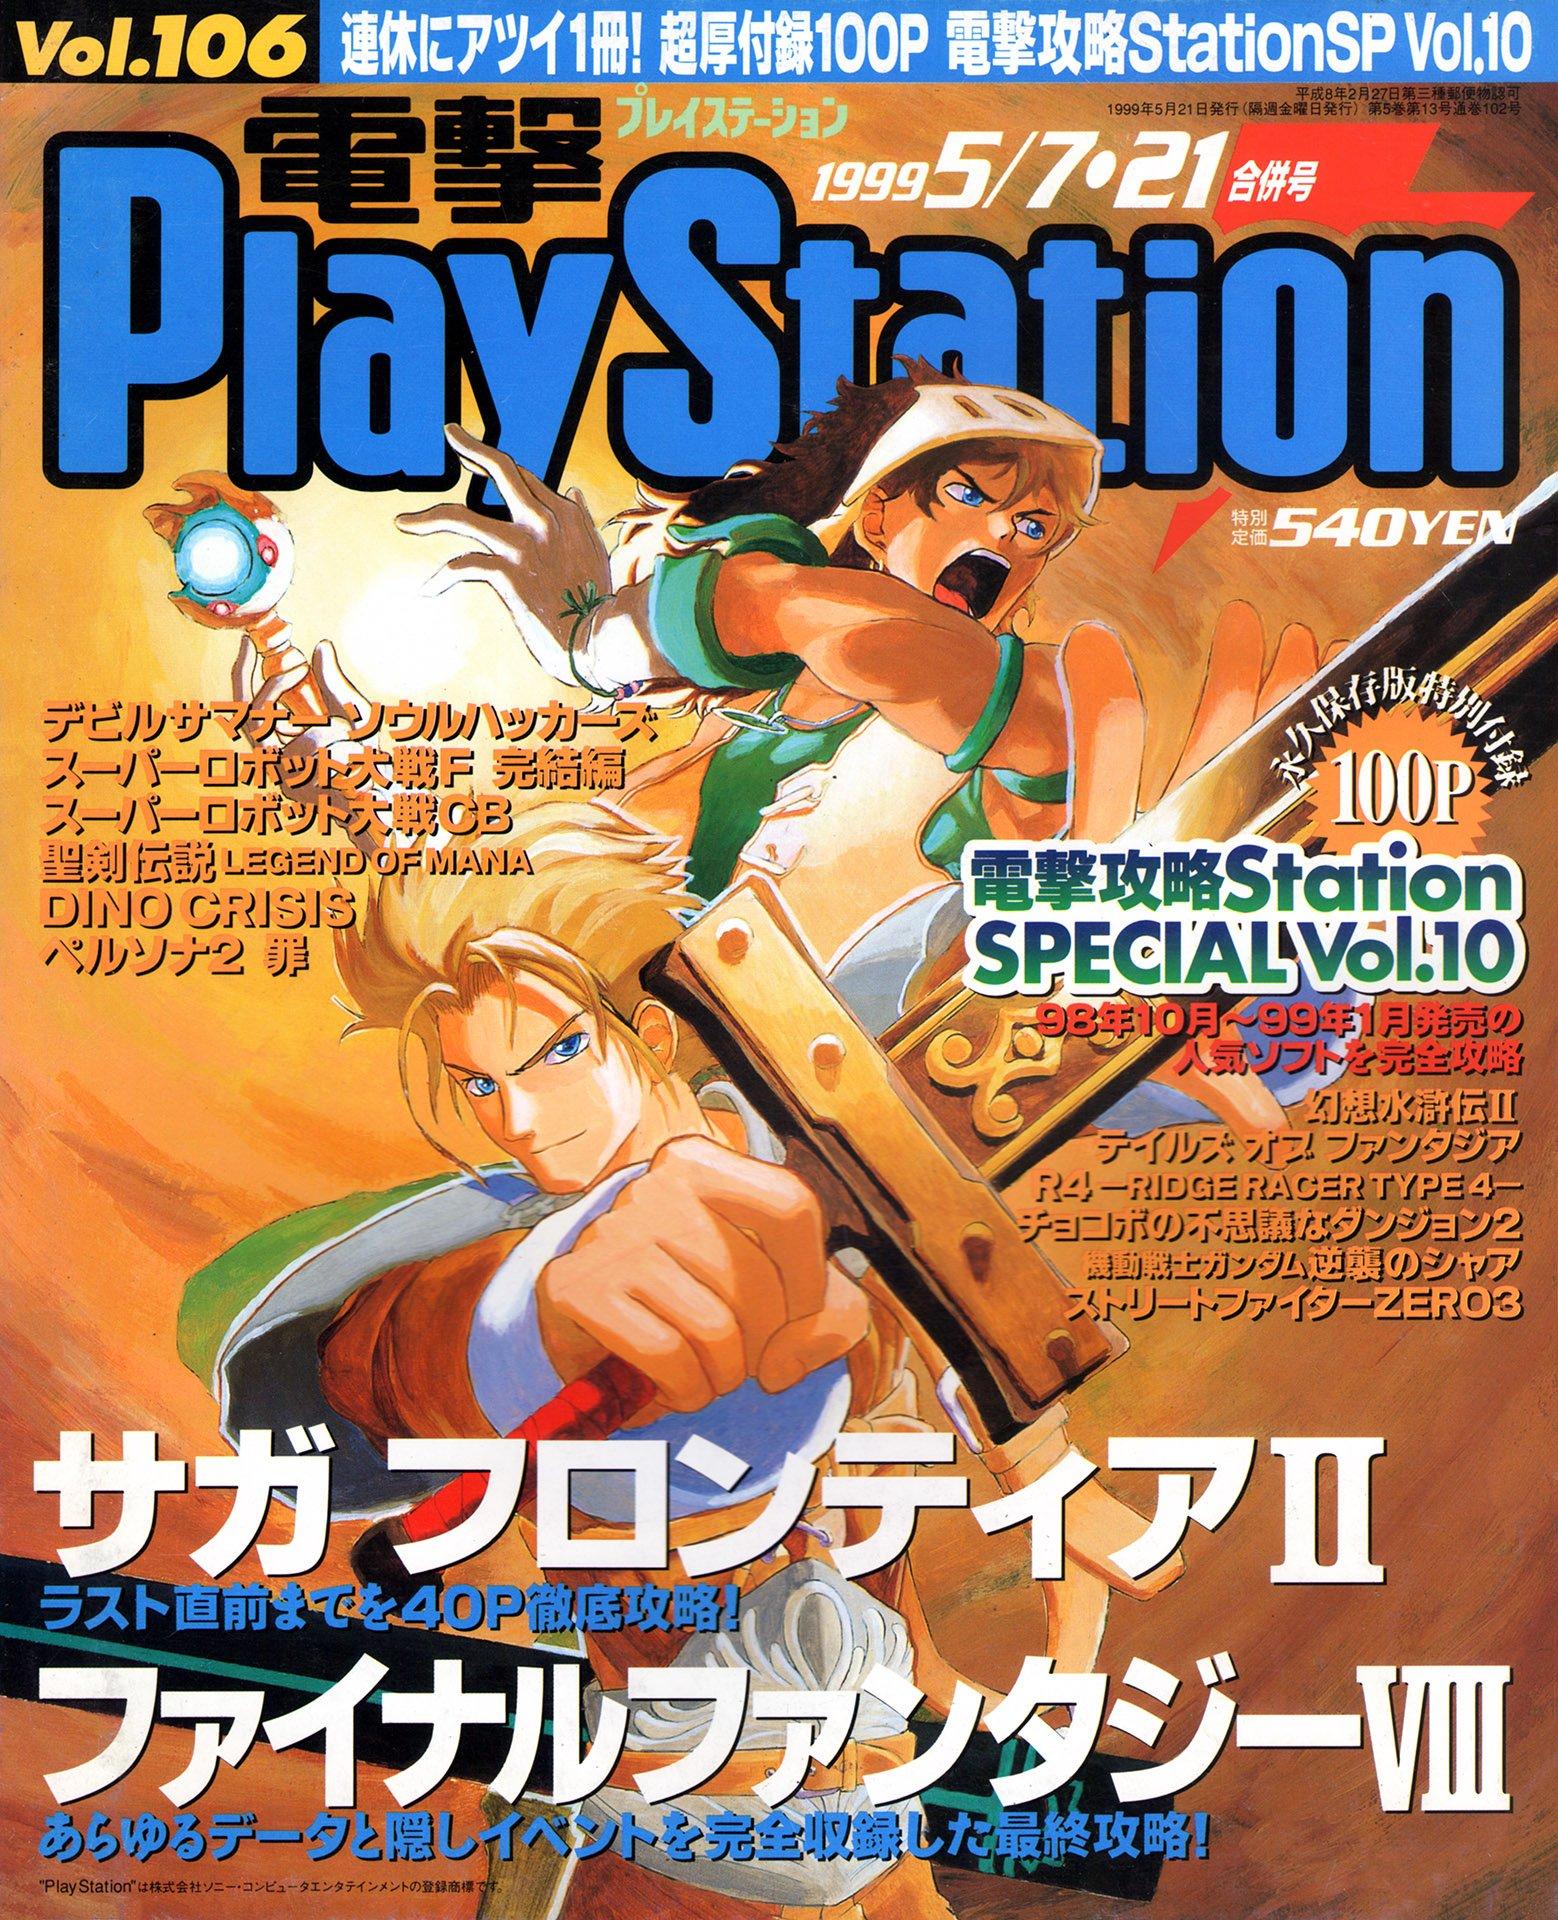 Dengeki PlayStation 106 (May 7/21, 1999)